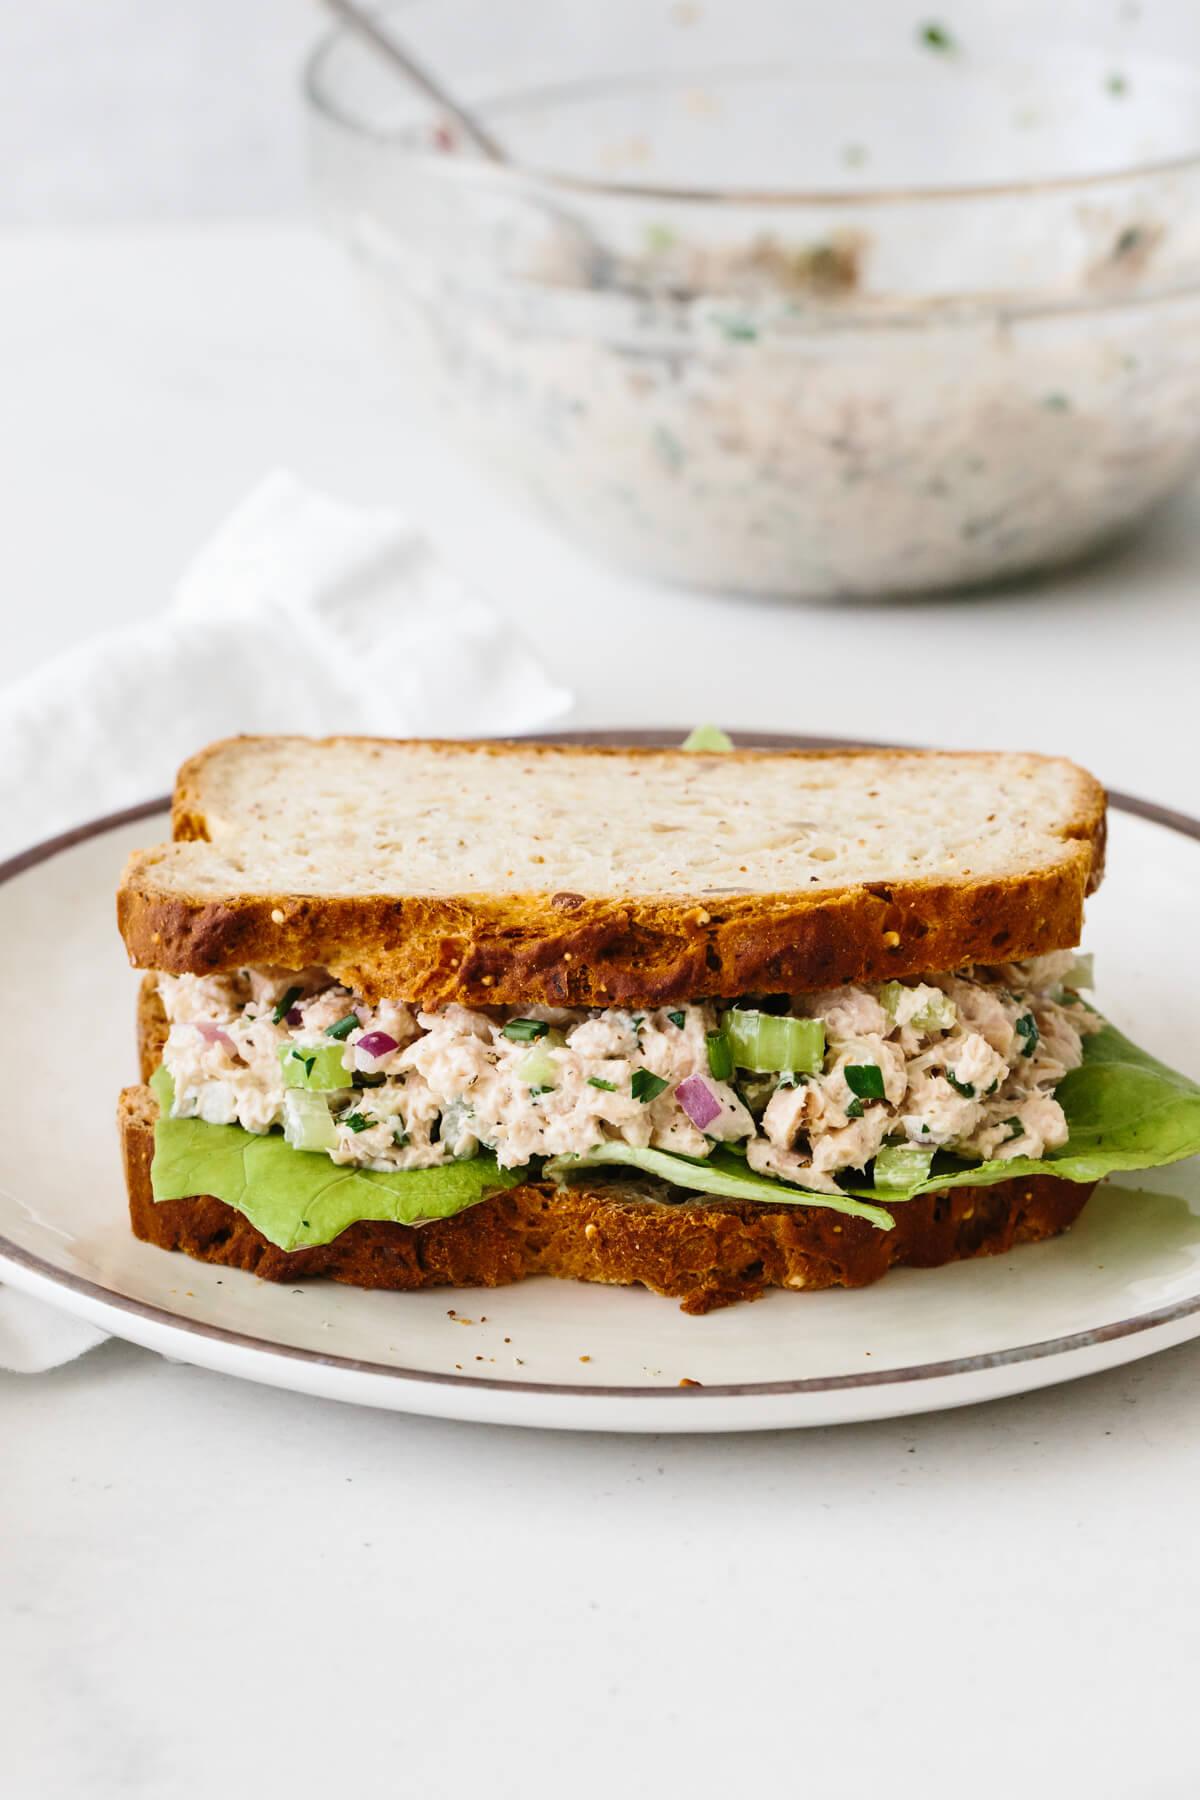 Tuna salad sandwich on a plate.